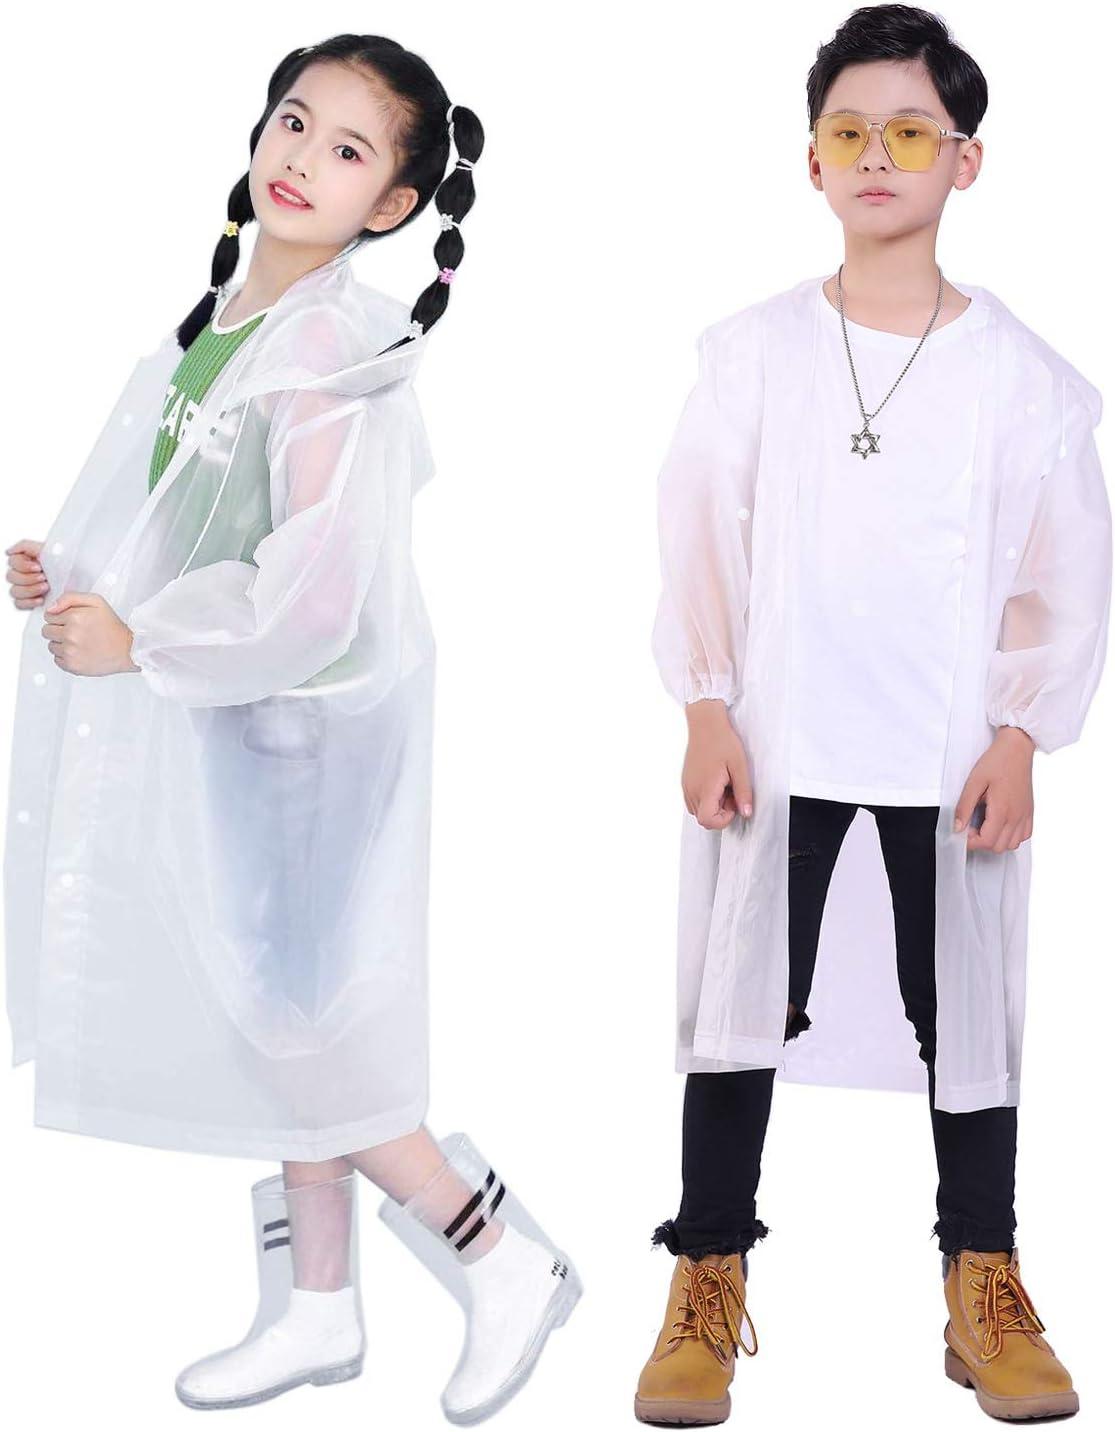 Gorain Pro Raincoat for Adults, EVA Rain Coats Reusable Rain Poncho and One Reusable Bag with Hood and Long Sleeves Pack of 2